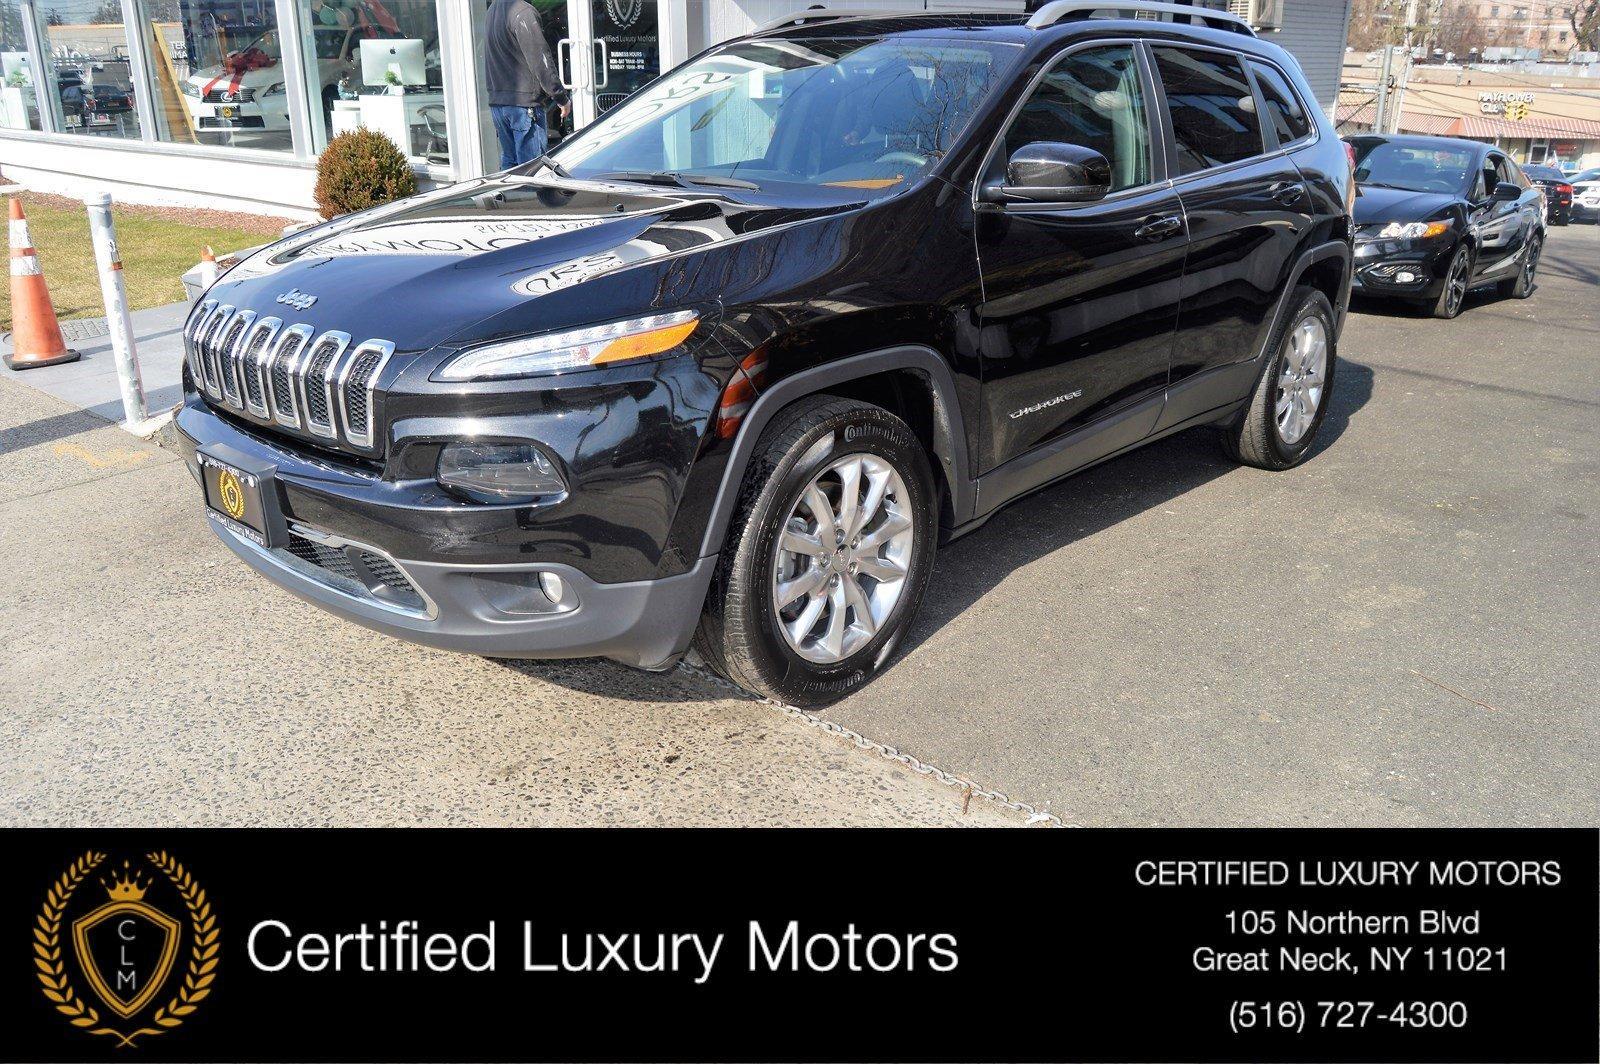 Used 2016 Jeep Cherokee Limited (Navi,Sunroof) | Great Neck, NY